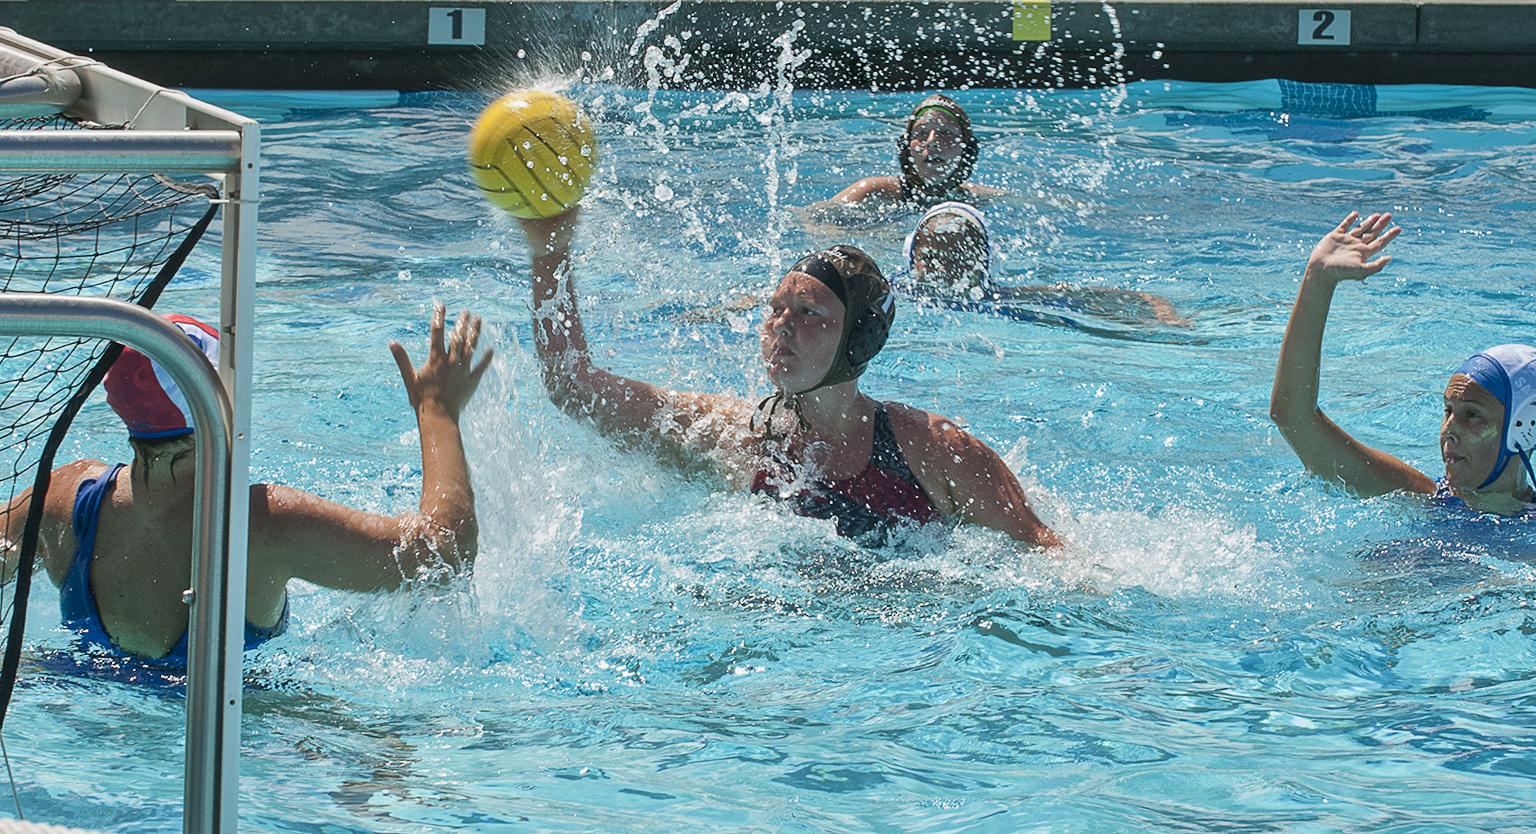 Women's water polo team wins inaugural match